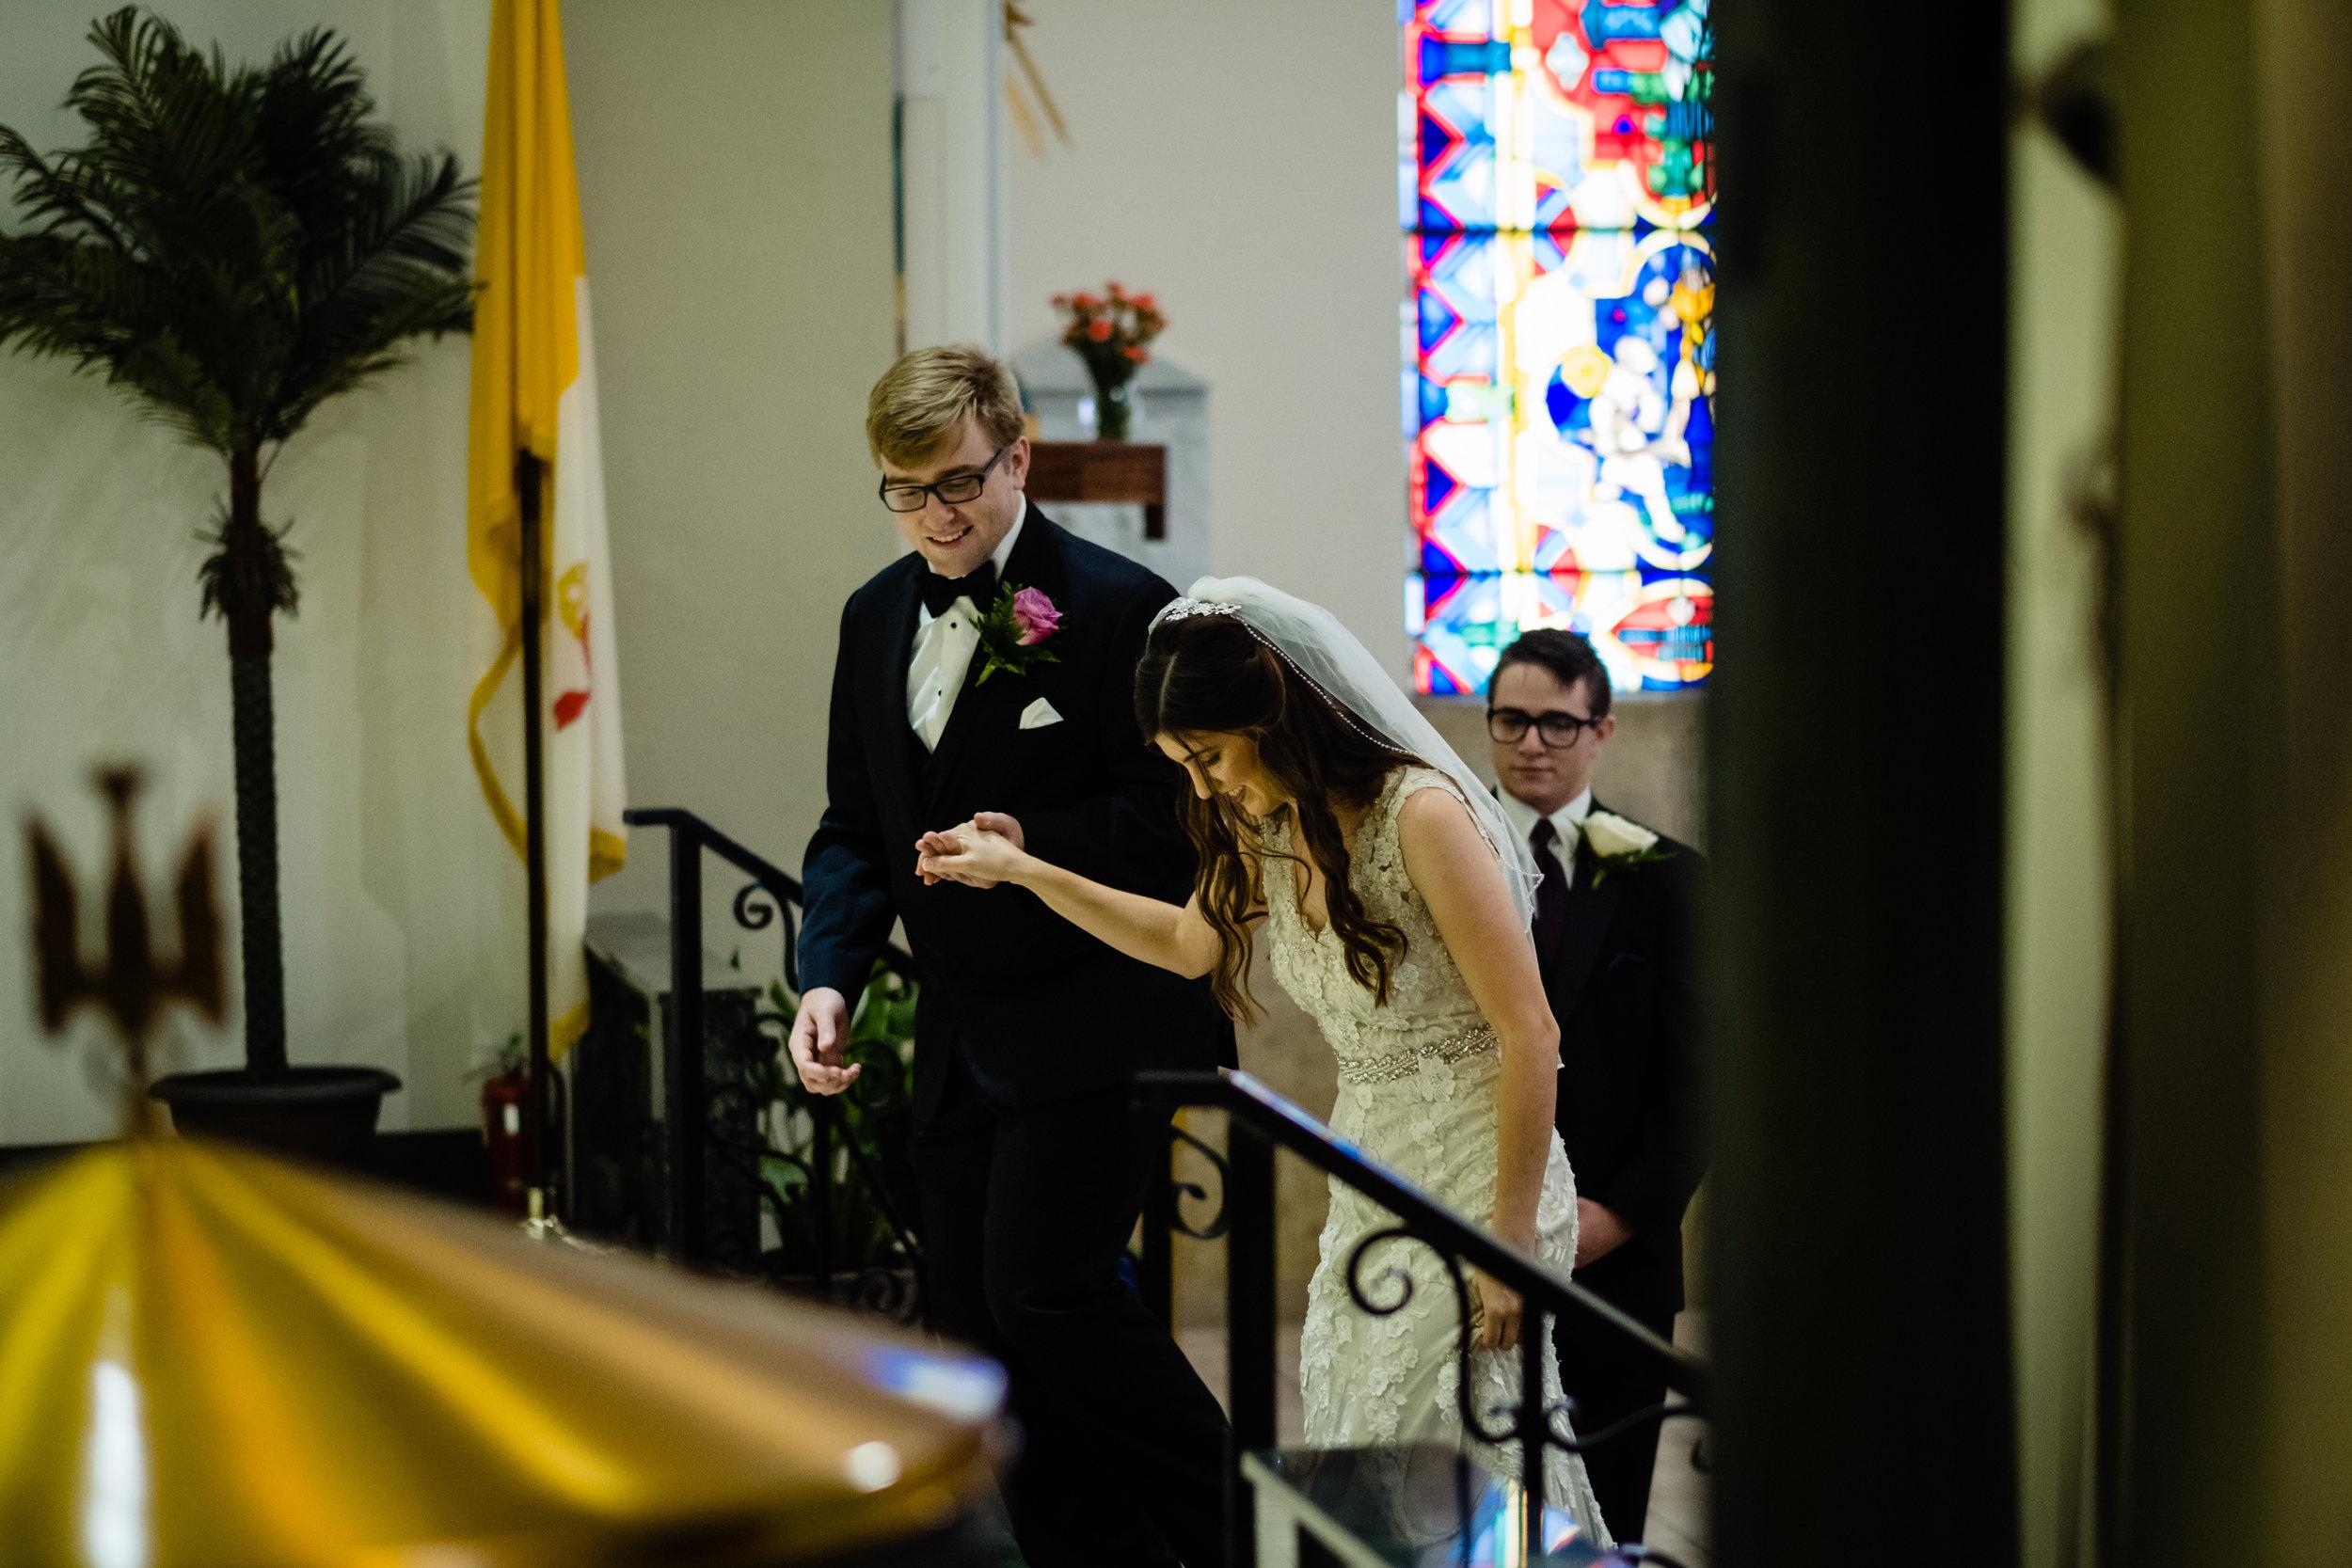 HAH_Zoe and Daniel_Clearwater Wedding_64_2018.jpg